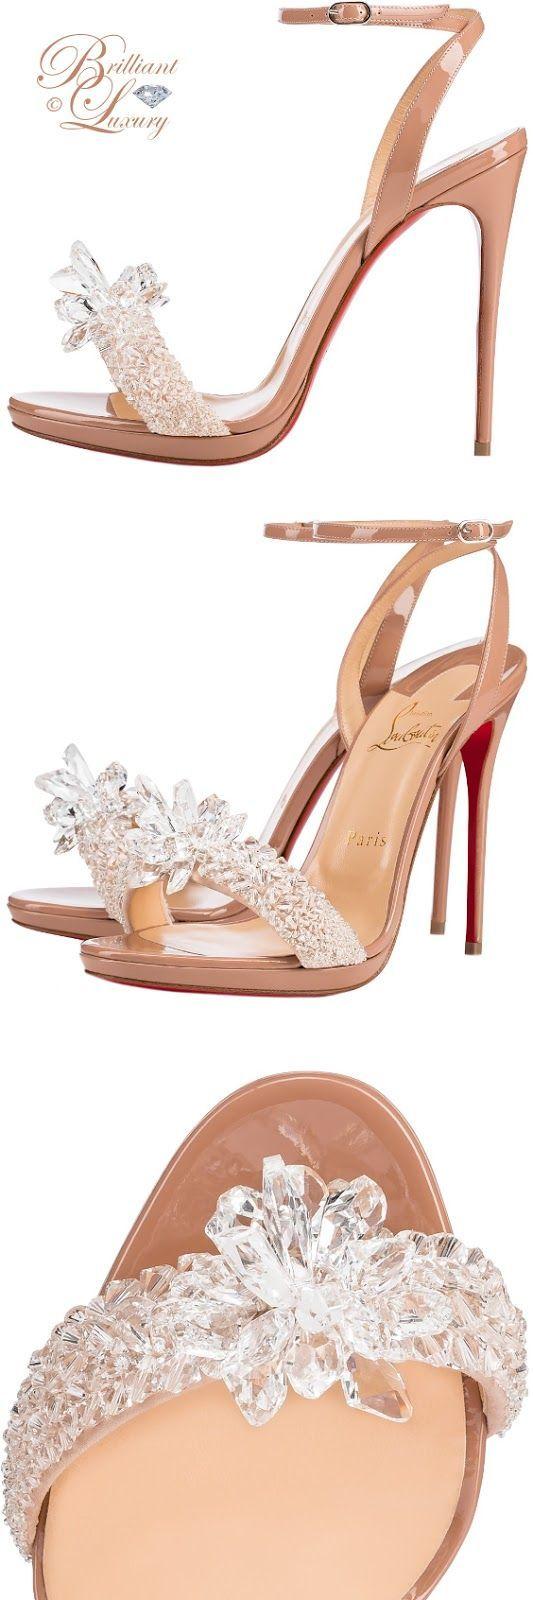 Brilliant Luxury by Emmy DE ♦ Christian Louboutin 'Crystal Queen'